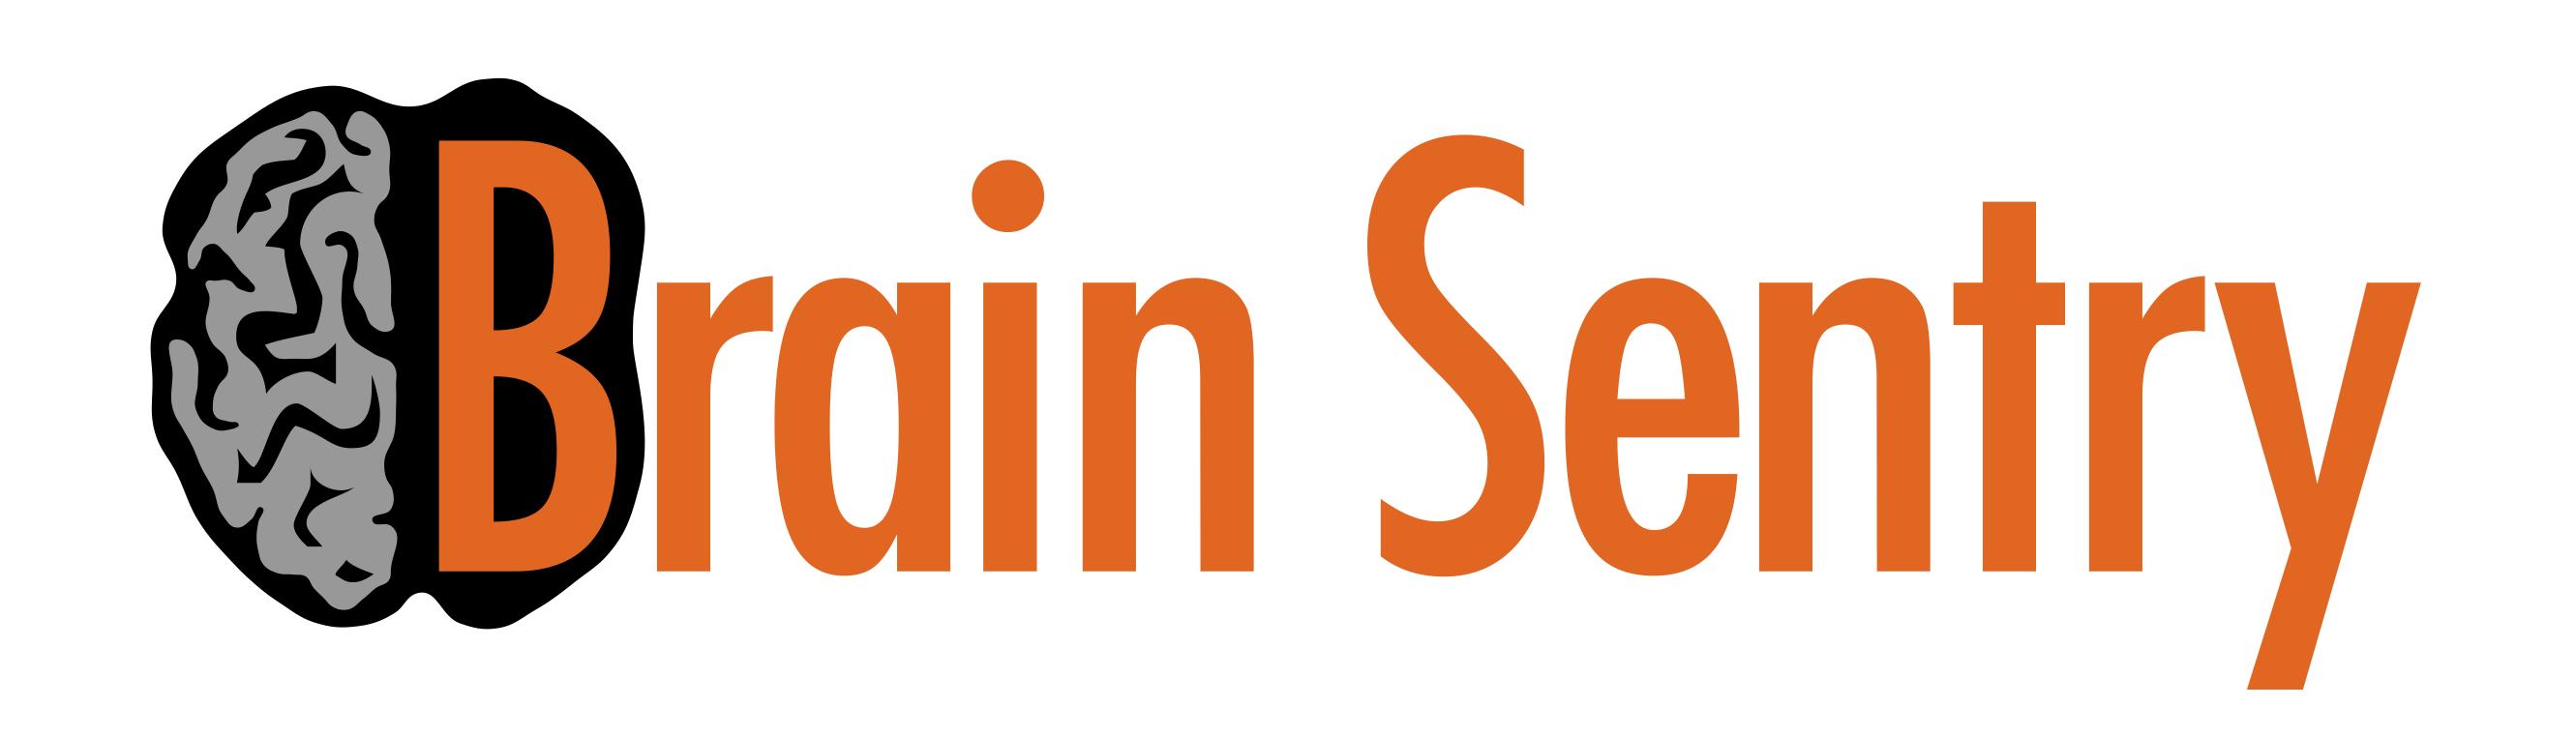 high-Rez-Brain-Sentry-logo-orange